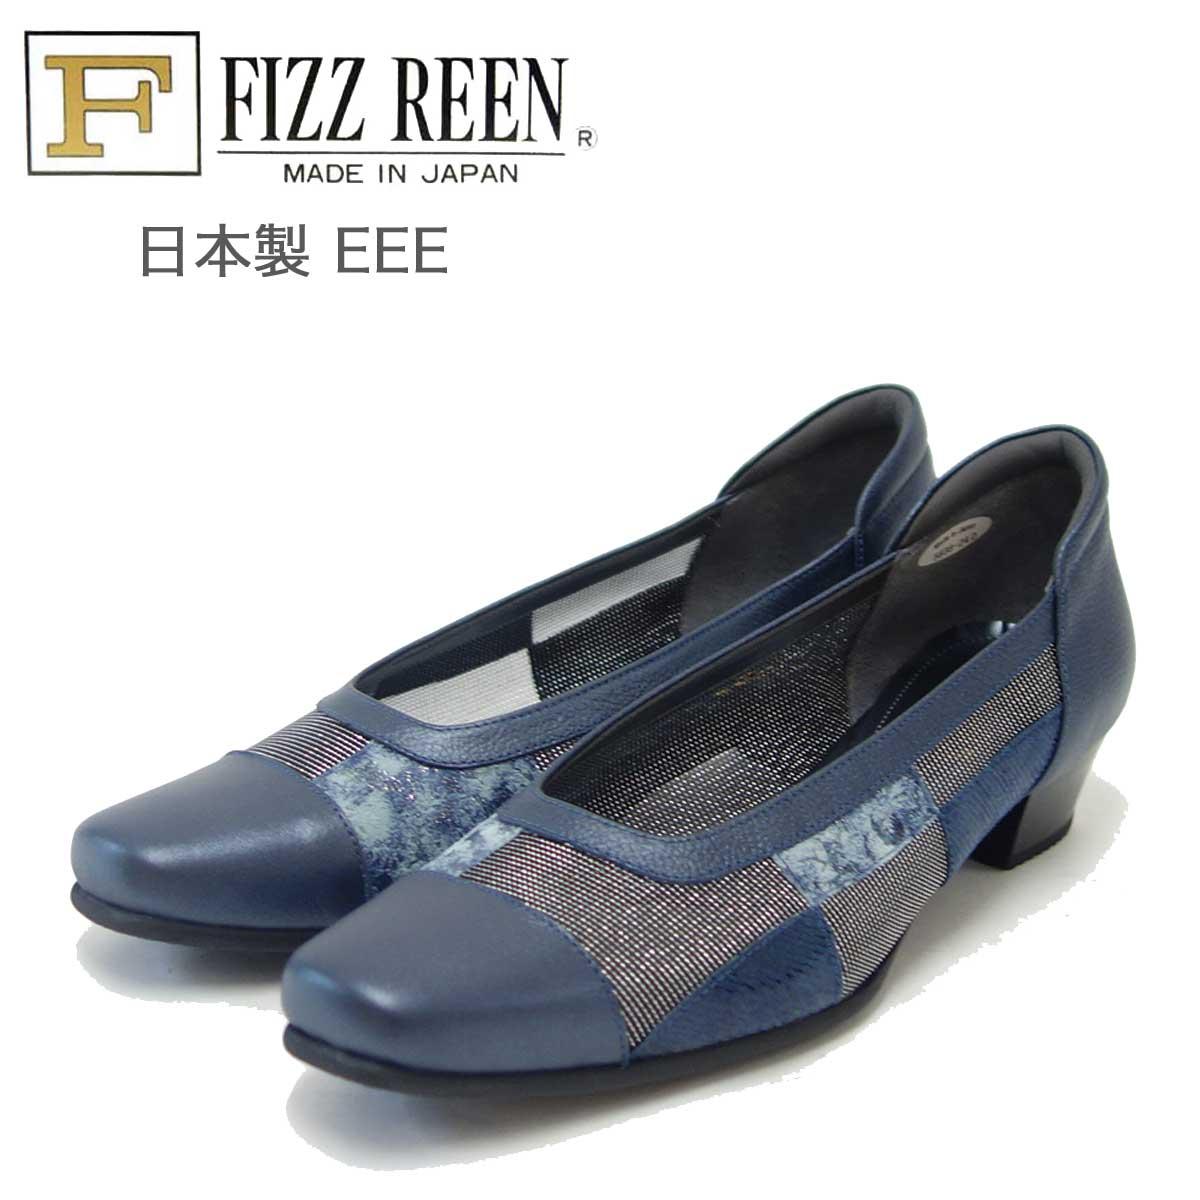 FIZZ REEN フィズリーン 5838 ネイビー(レディース)涼しげなチュール素材のパンプス(日本製)「靴」